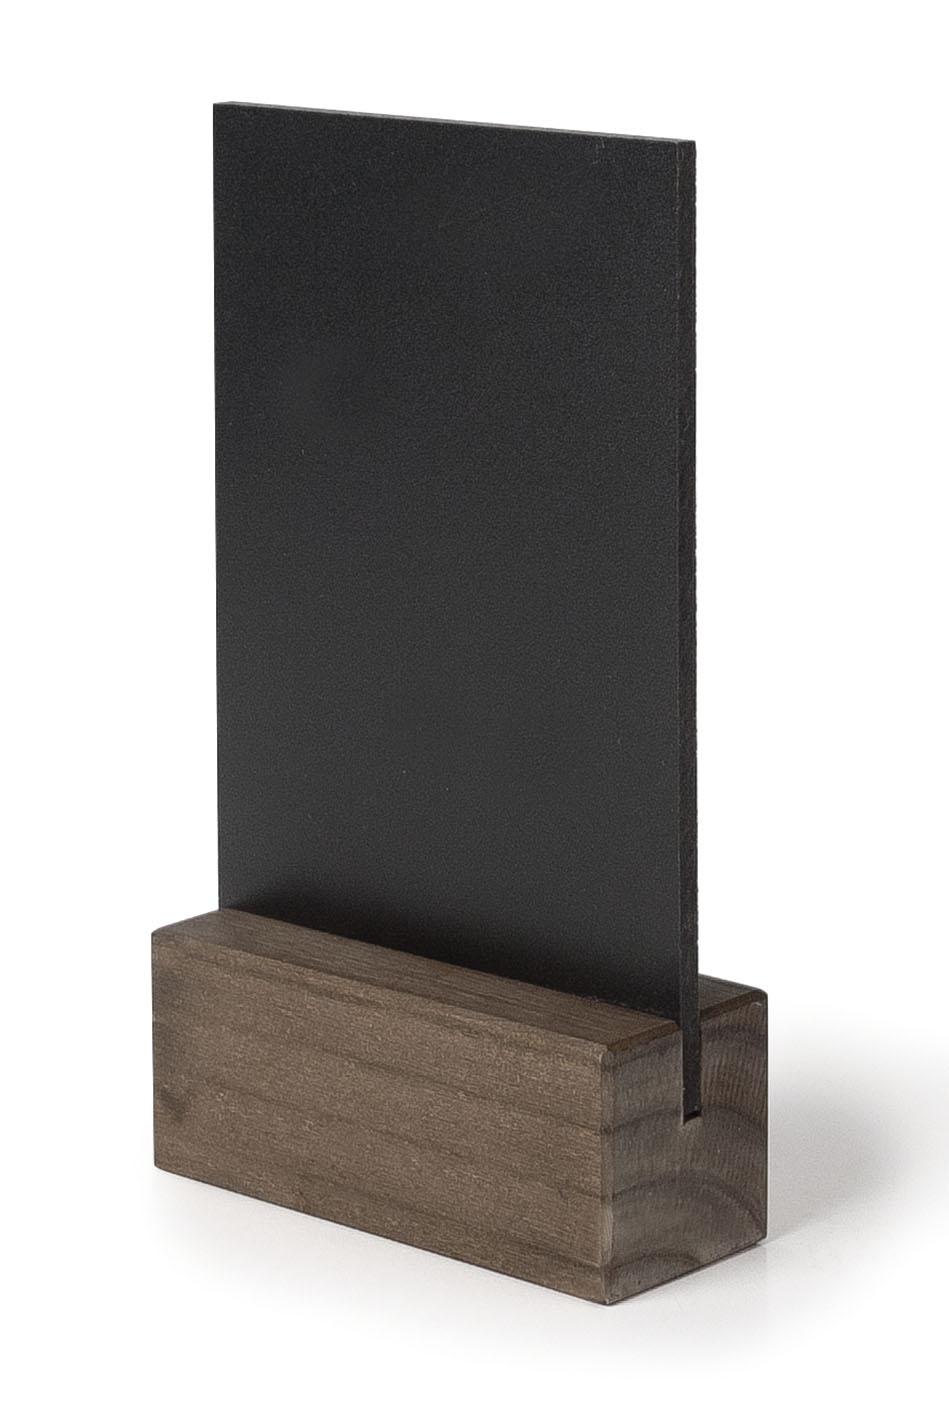 Informační tabulka 10x15 cm